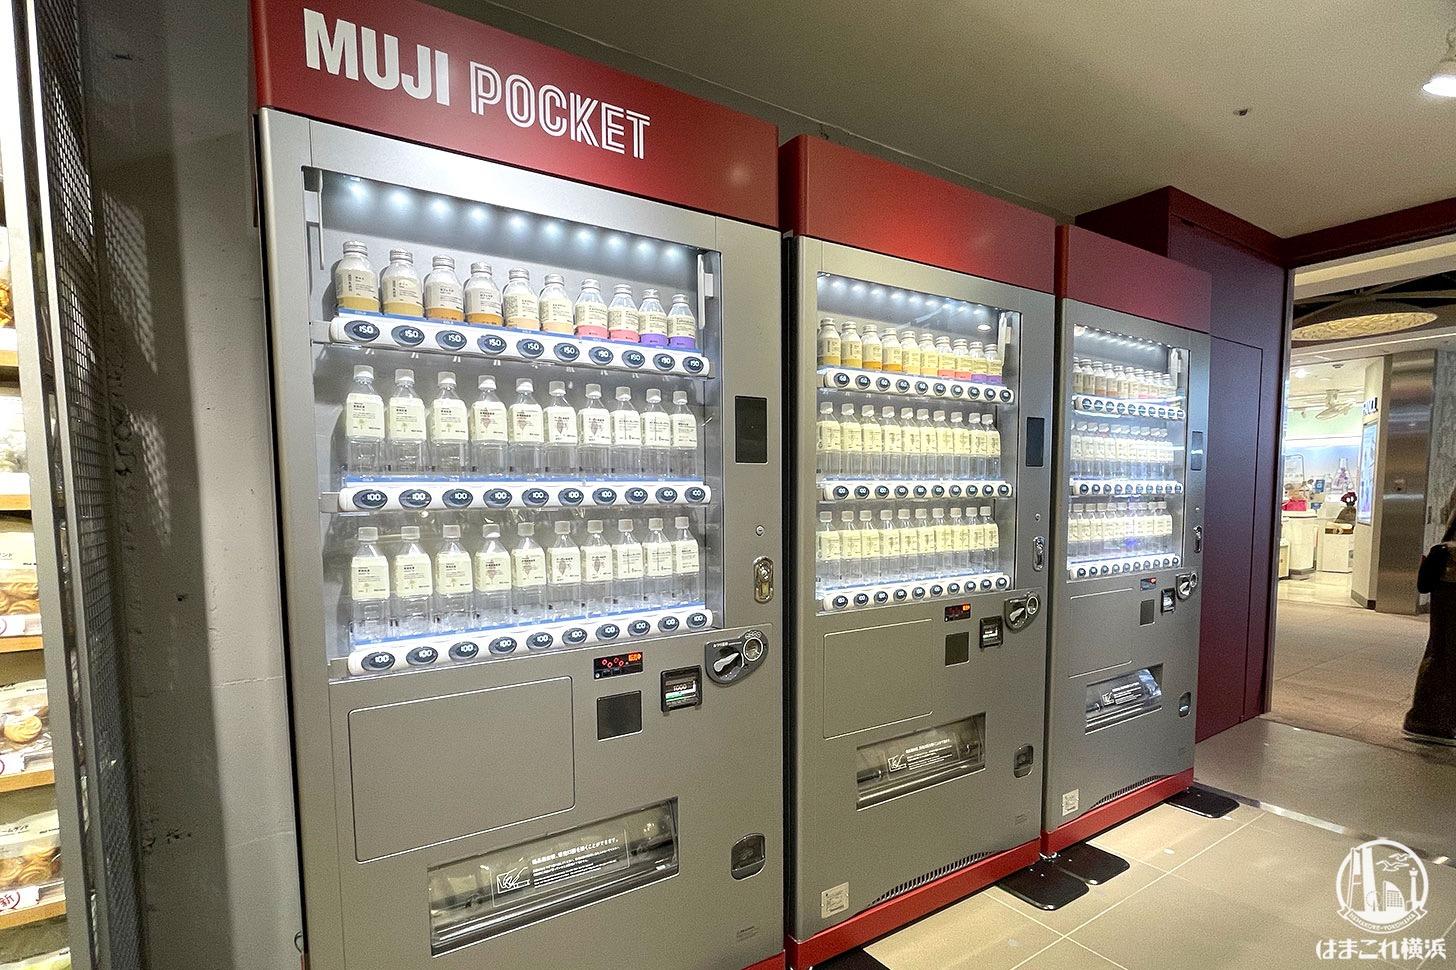 自動販売機「MUJI POCKET」